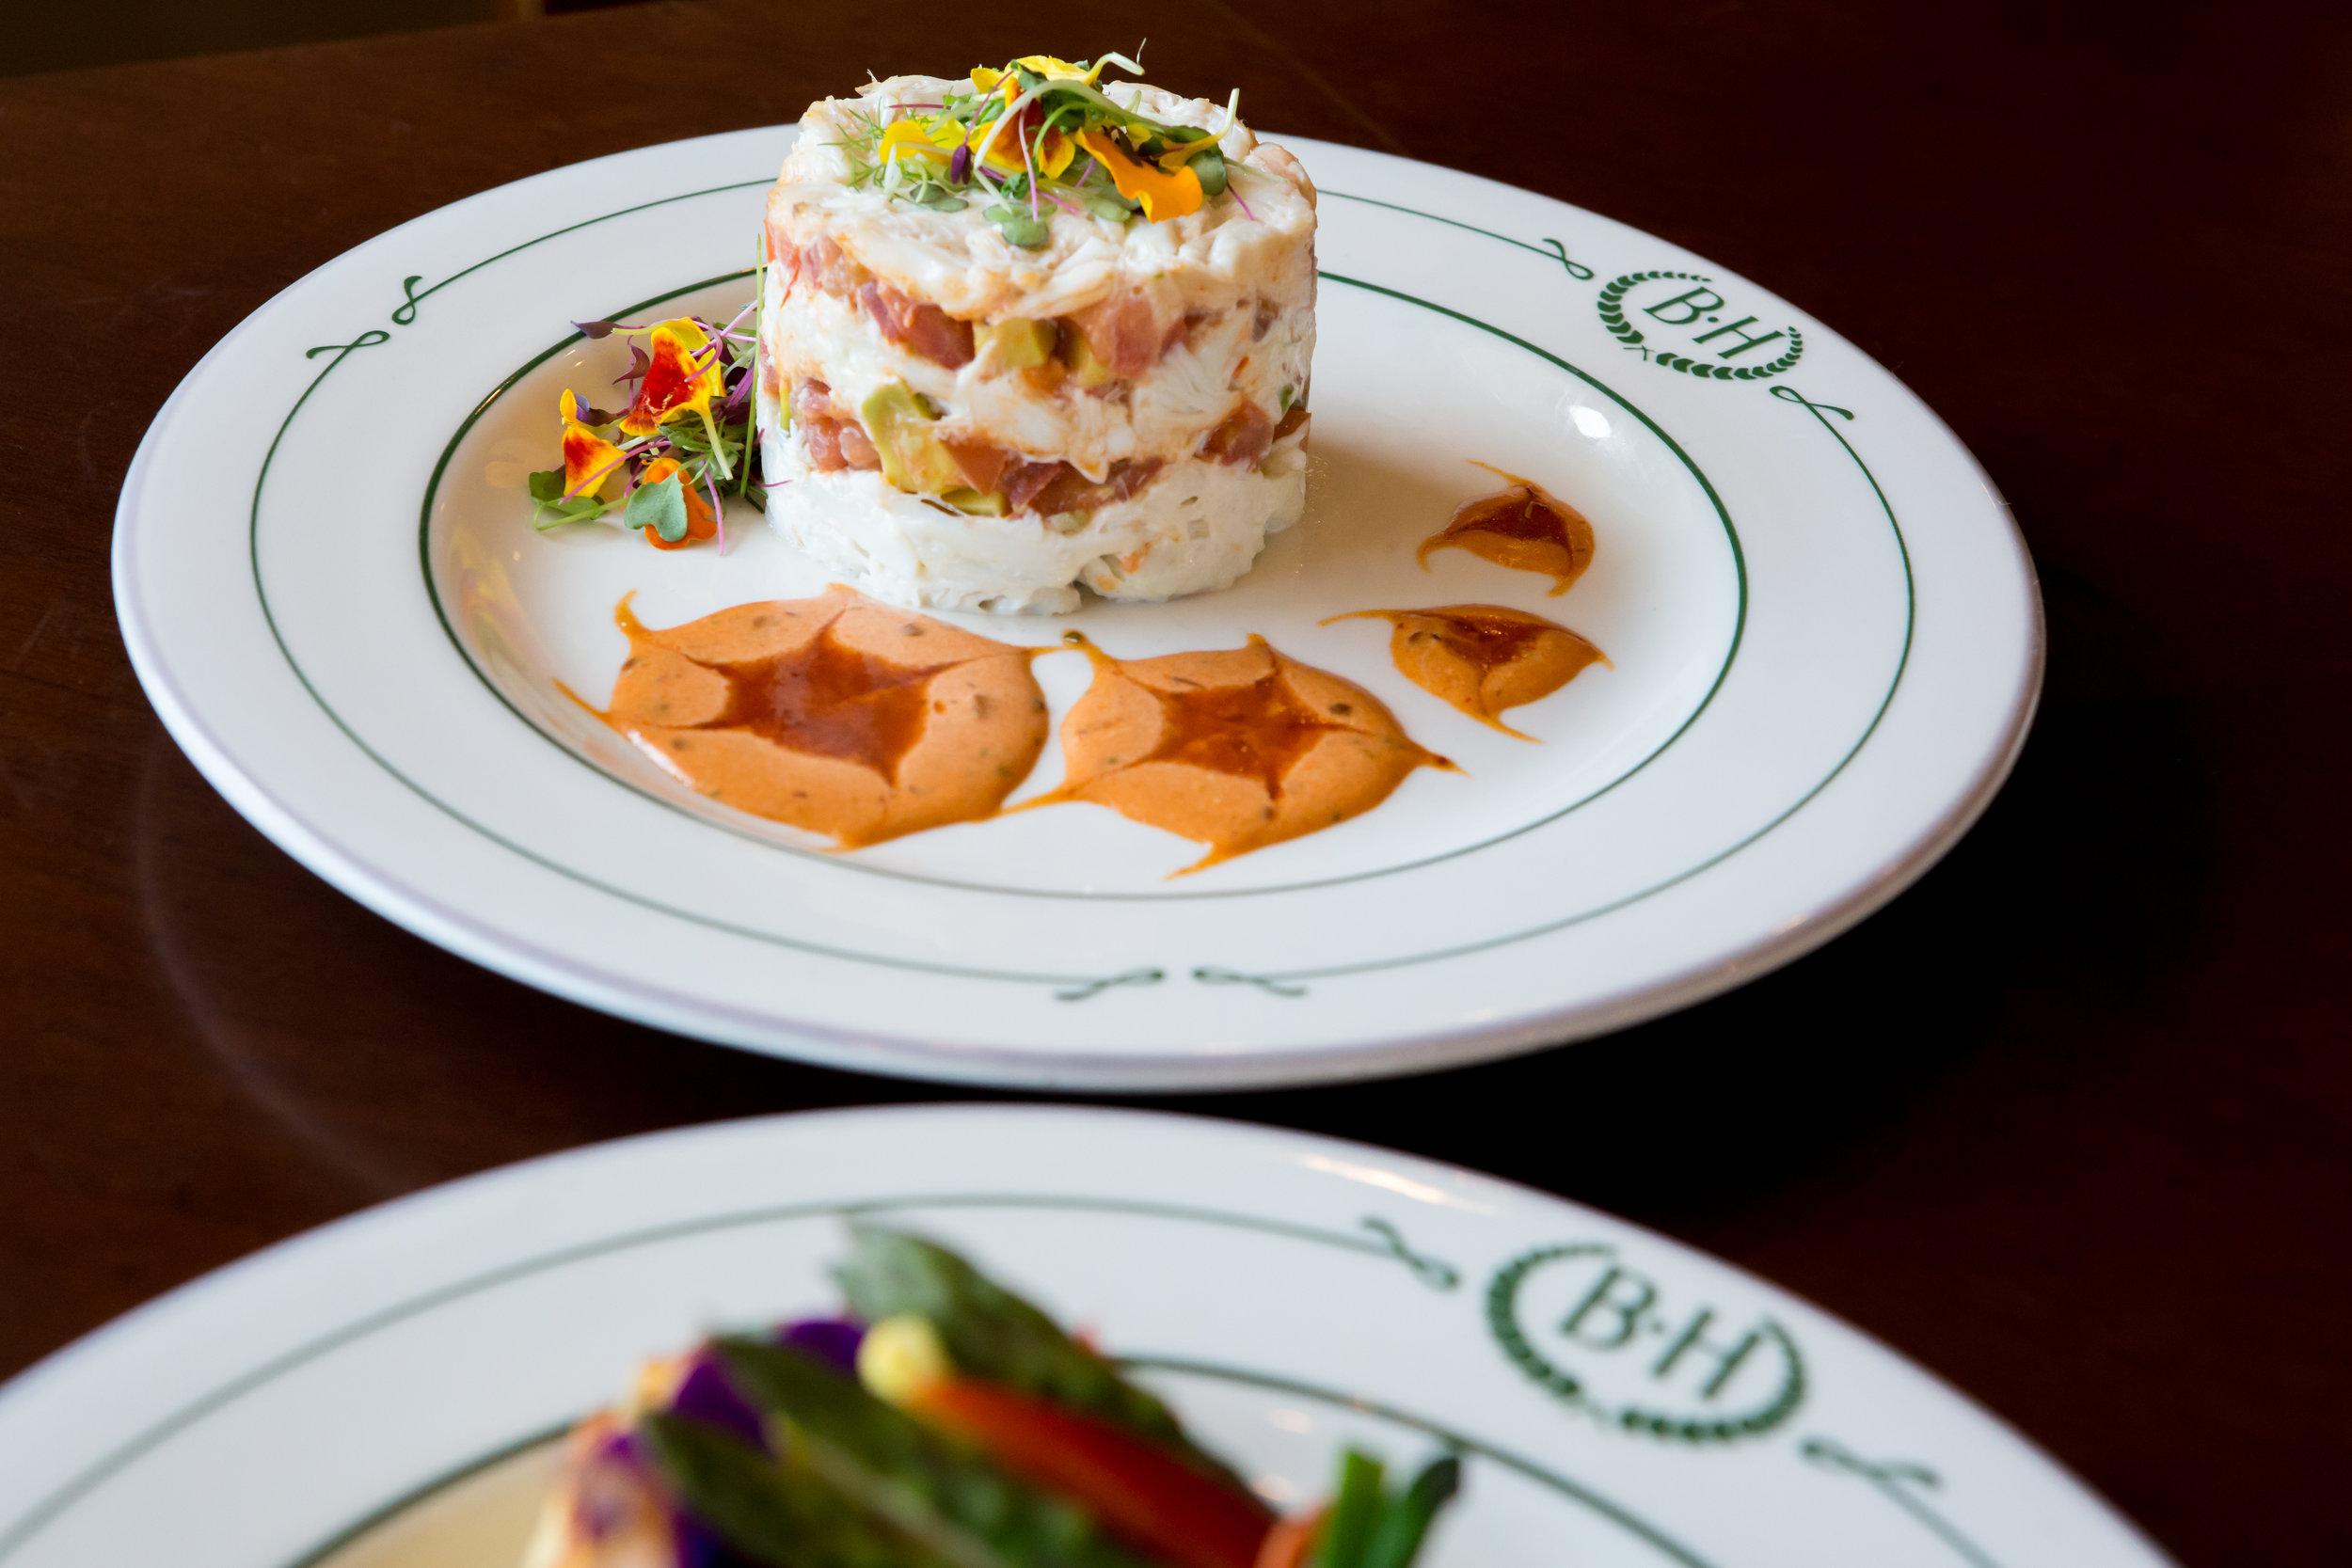 food-photography-chef-portrait-golf-dynamite-studio-HLC-dinnerwear.jpg